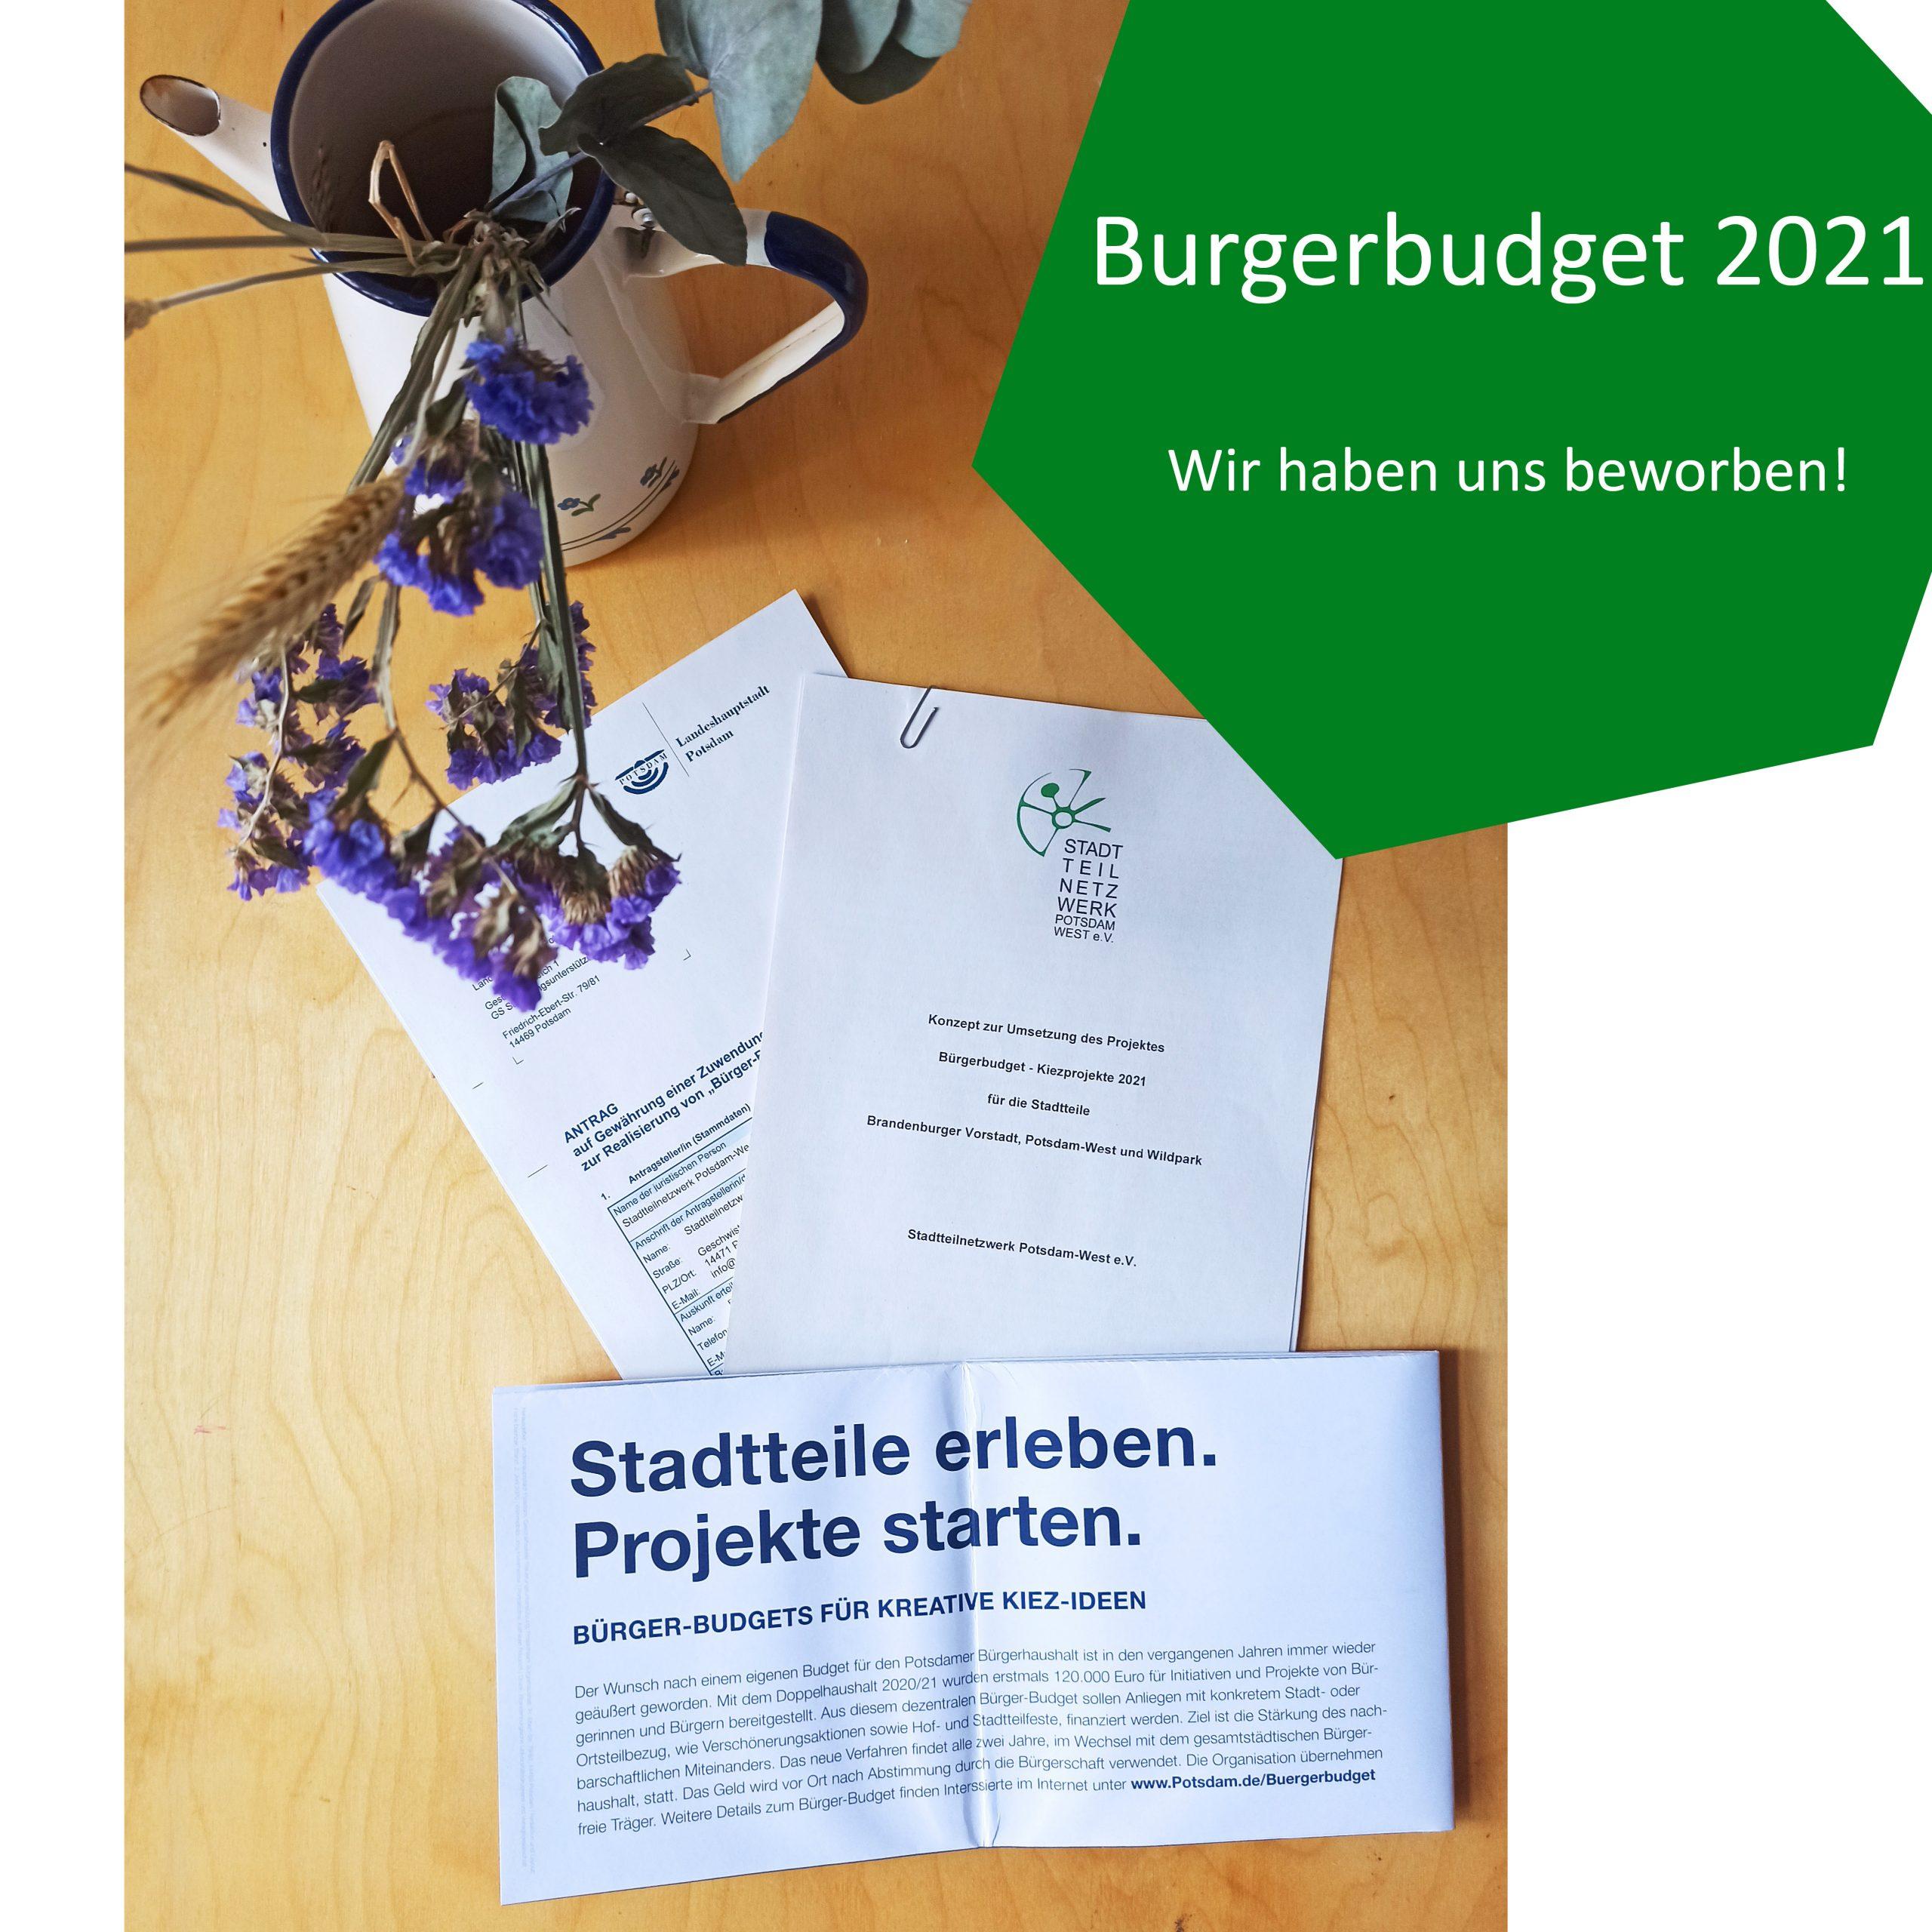 Bürgerbudget